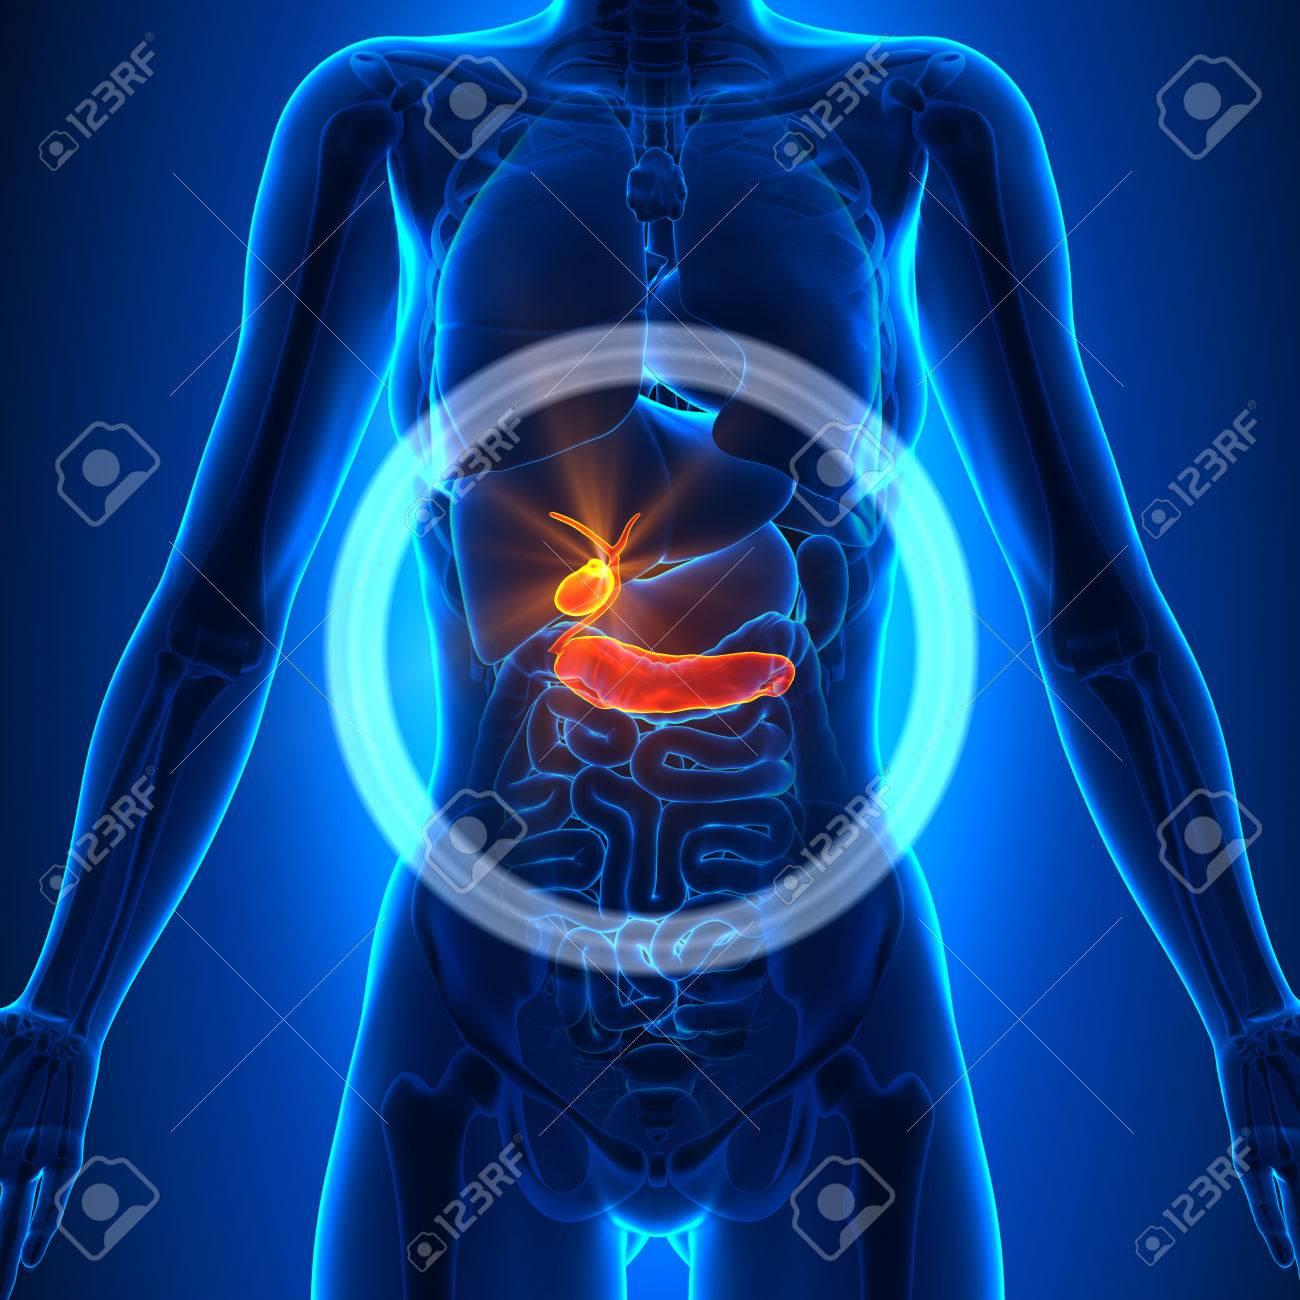 Gallbladder / Pancreas - Female Organs - 33946551